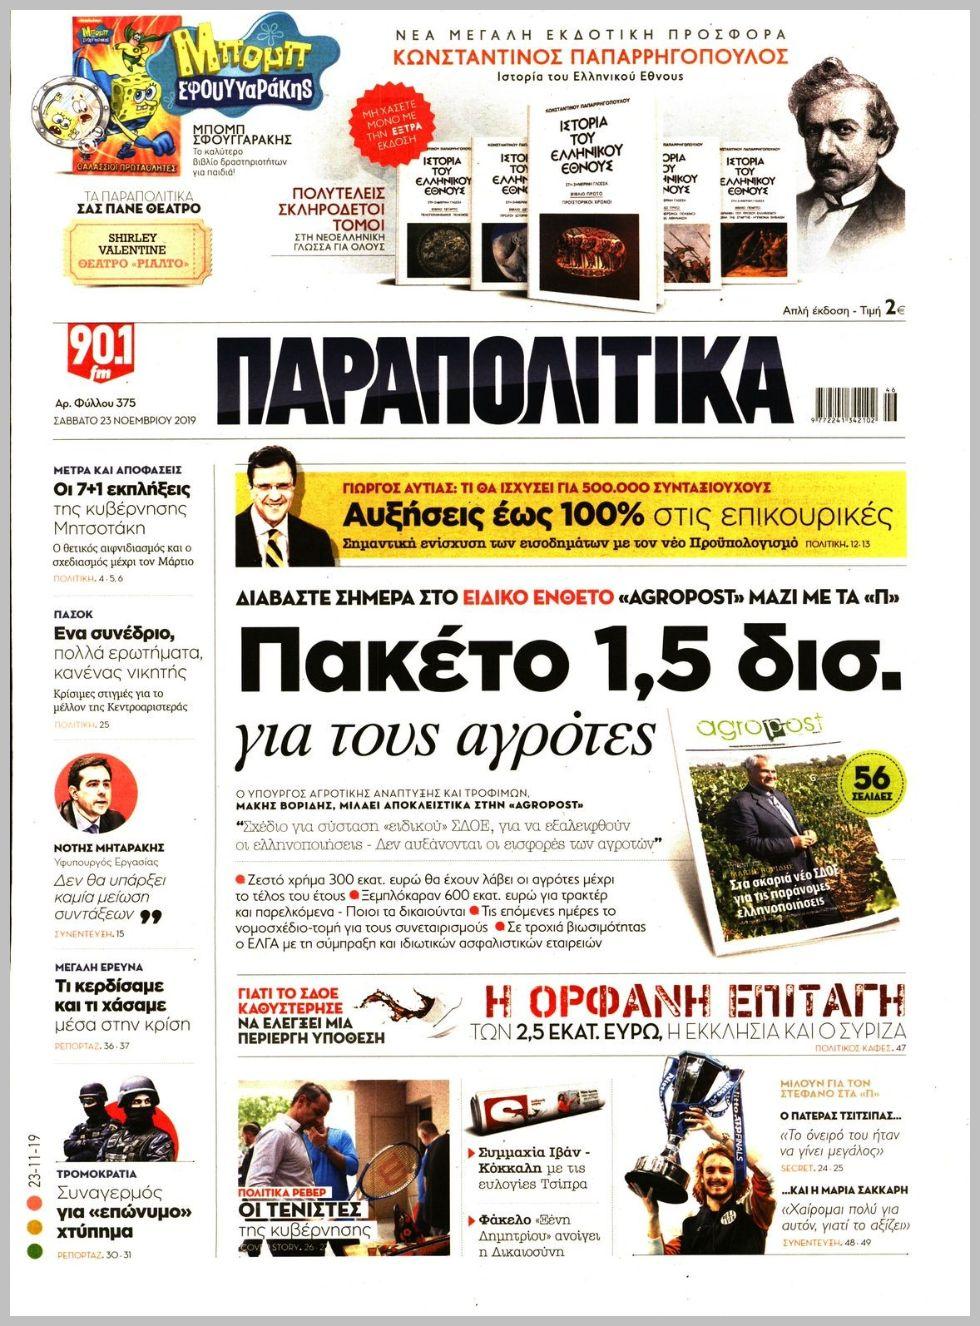 https://protoselida.24media.gr/images/2019/11/23/lrg/20191123_parapolitika_0306.jpg